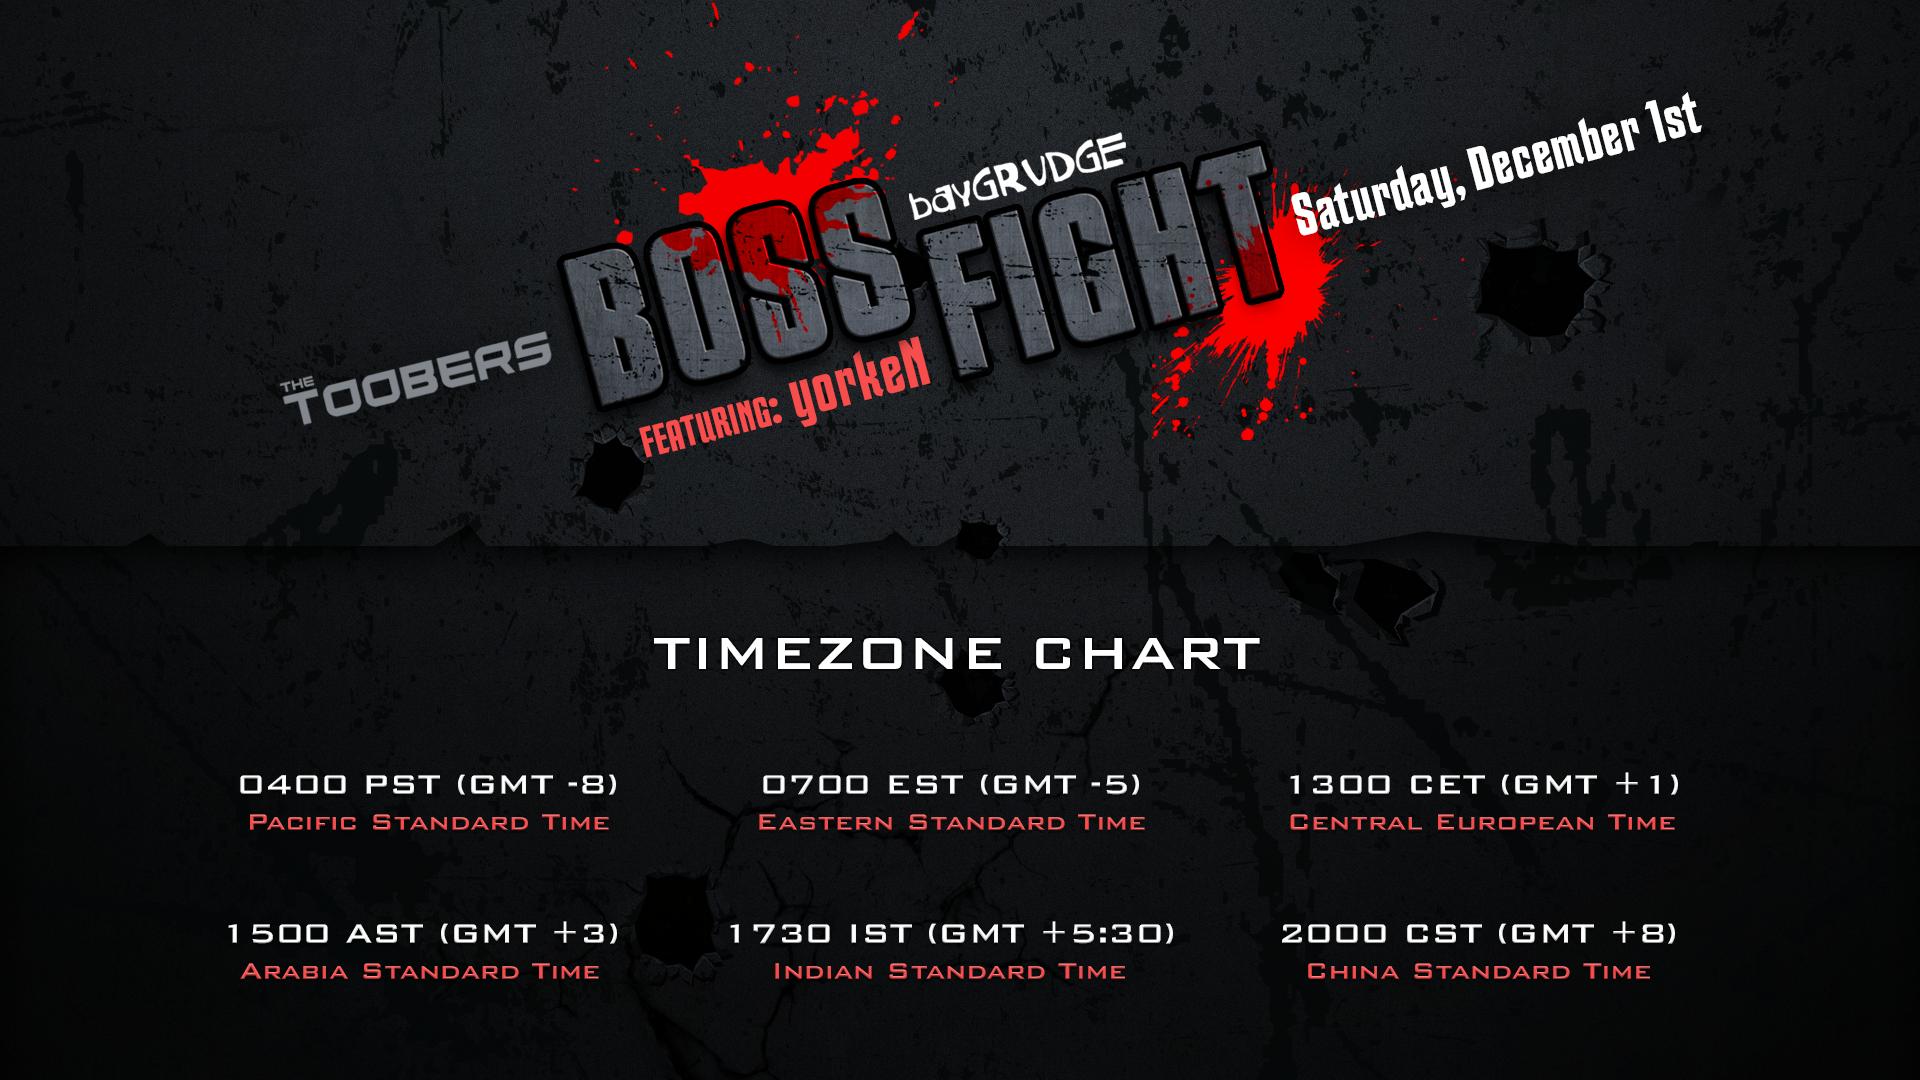 BossFight_TimeZone_Chart.png